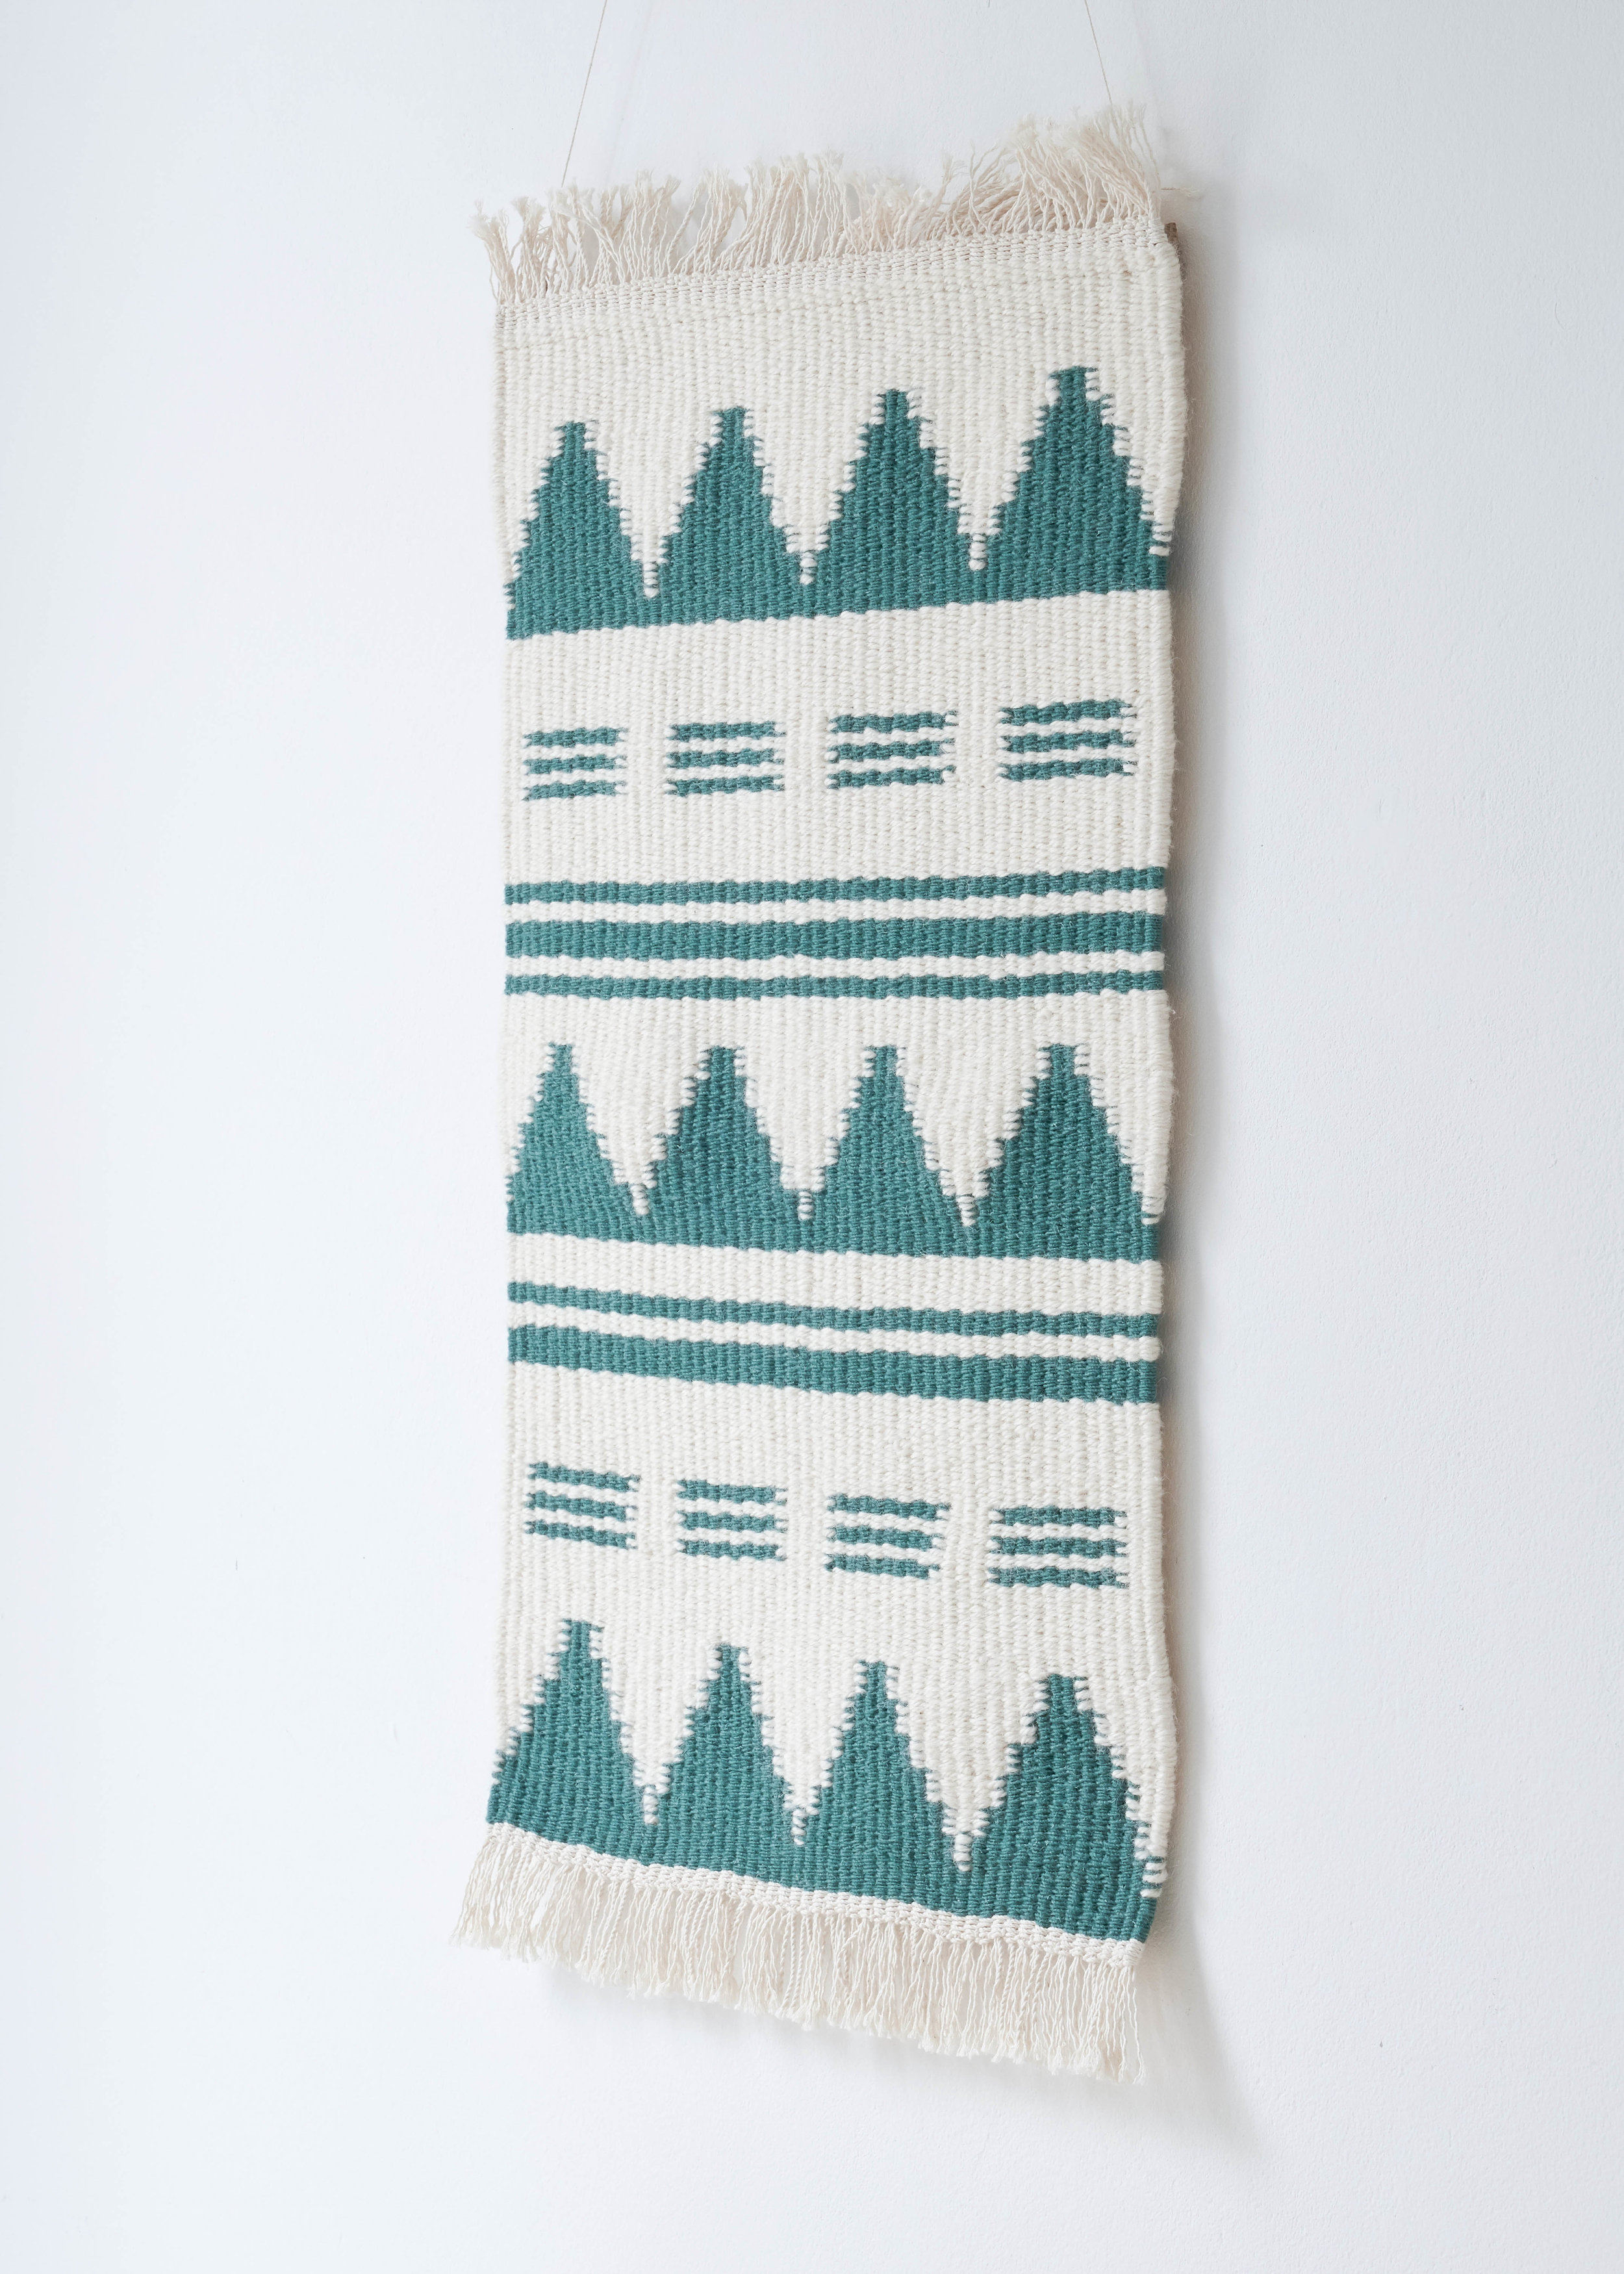 Christabel-Balfour-Pine Forest 002.jpg